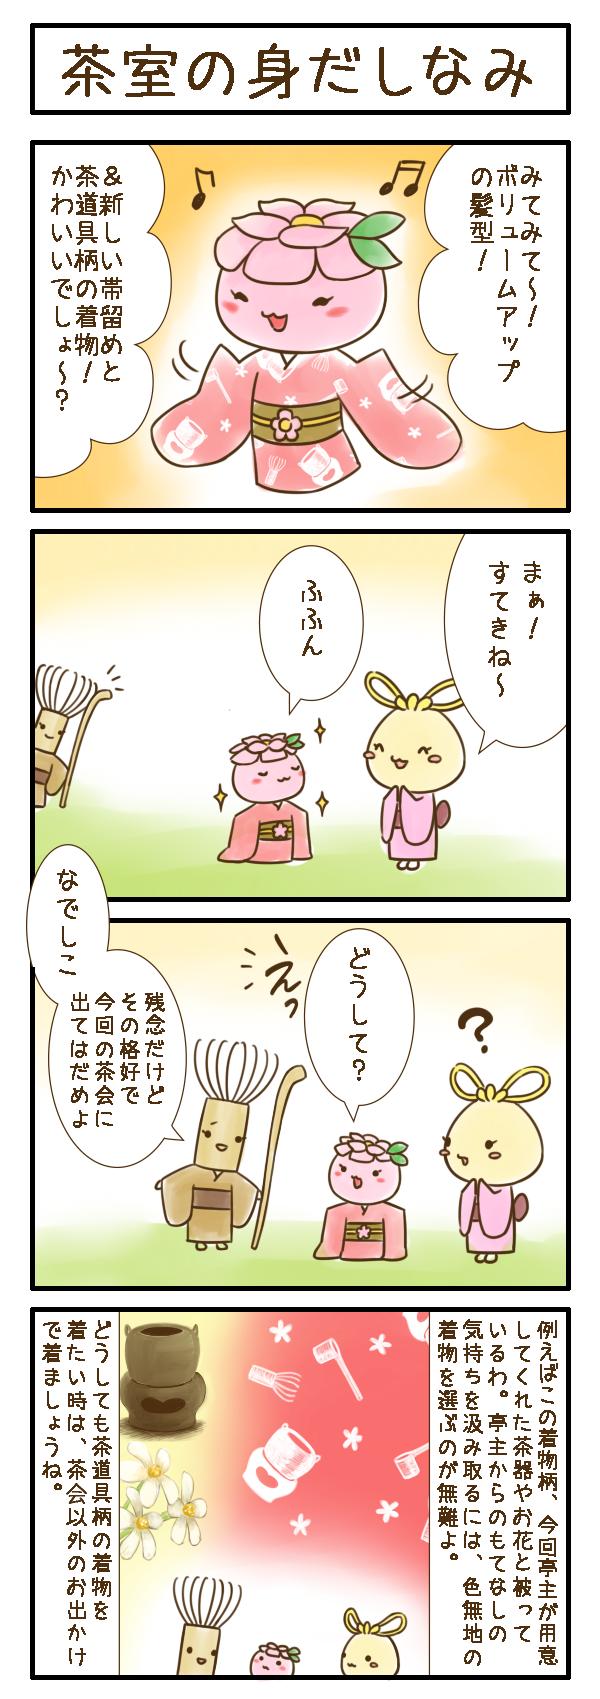 midashinami01